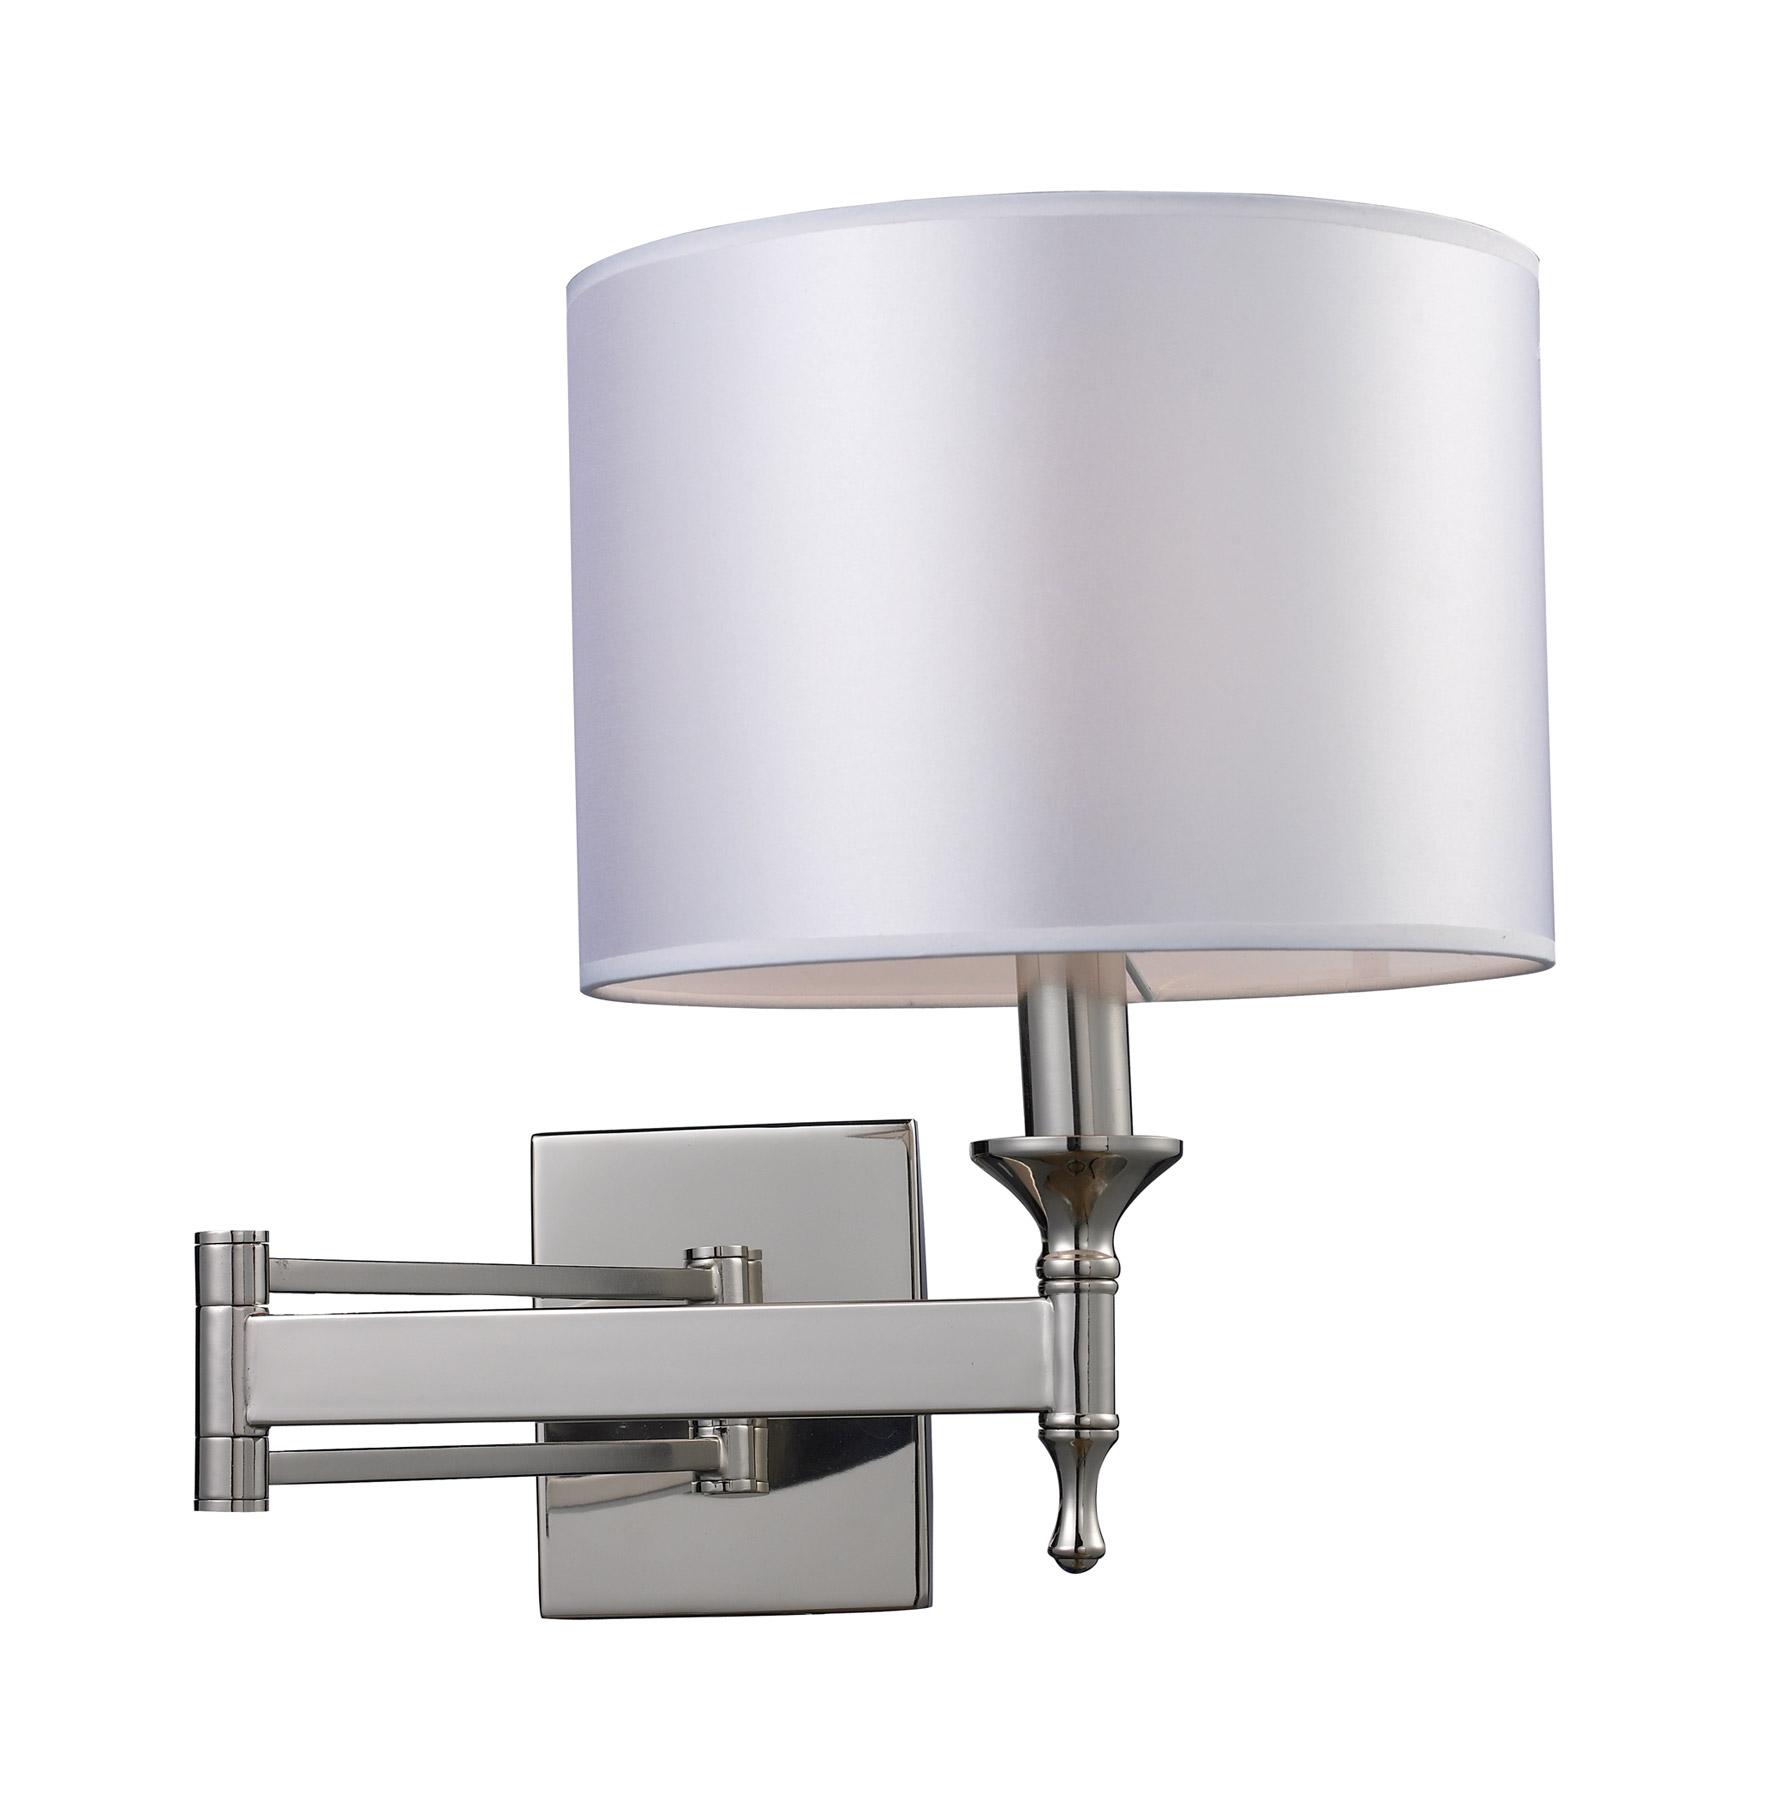 Bedroom Swing Arm Wall Sconces lighting 10160/1 pembroke swing arm wall sconce